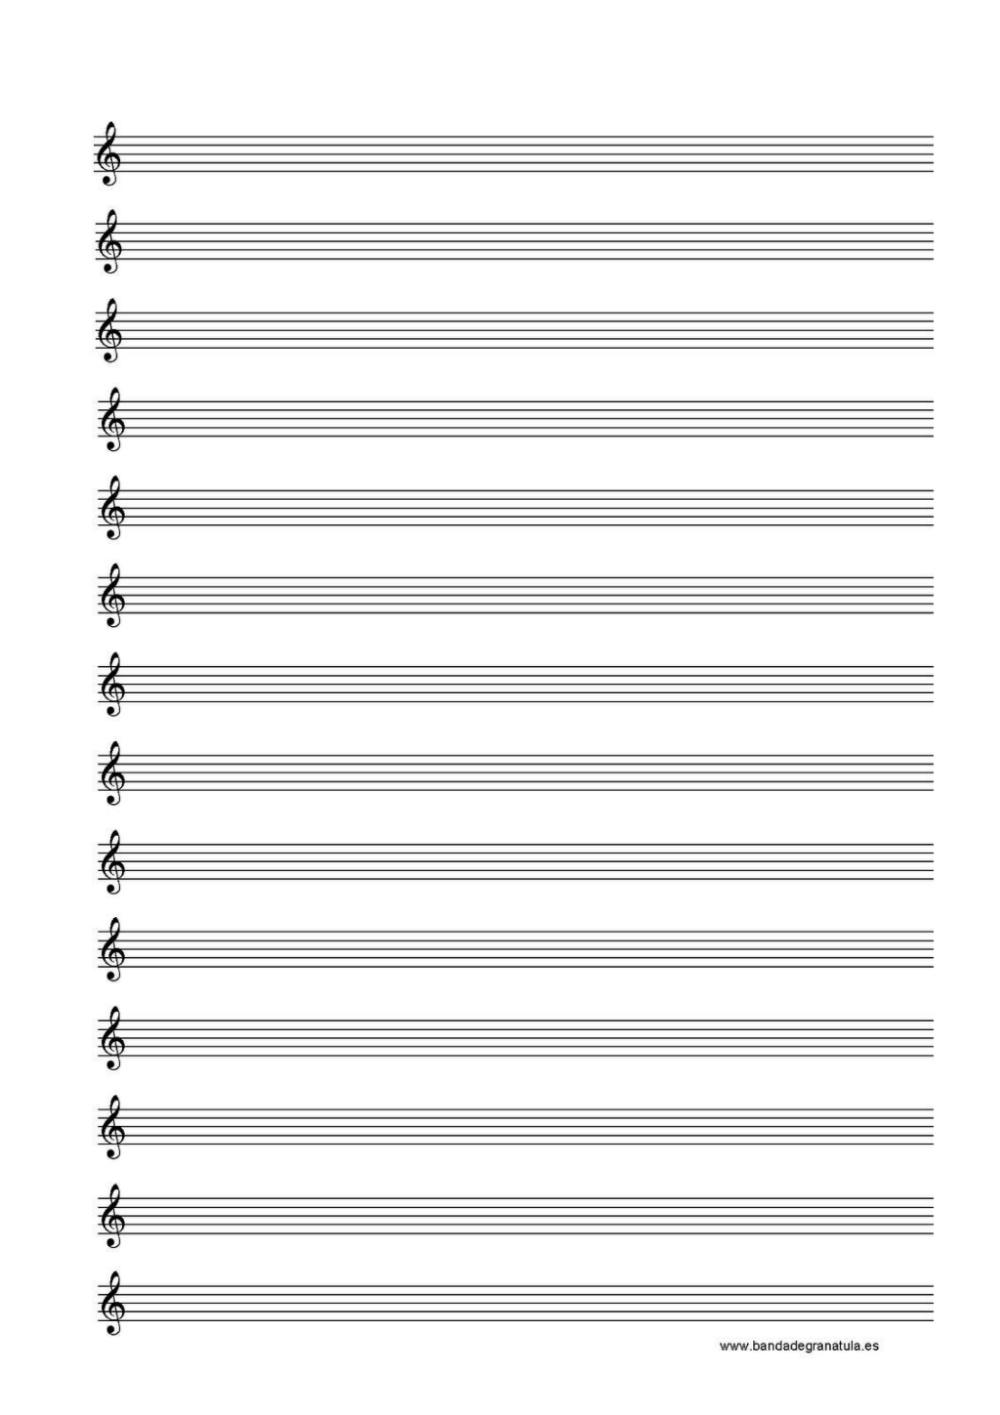 Folha De Partitura Musical Modelo 1 Pdf Google Drive